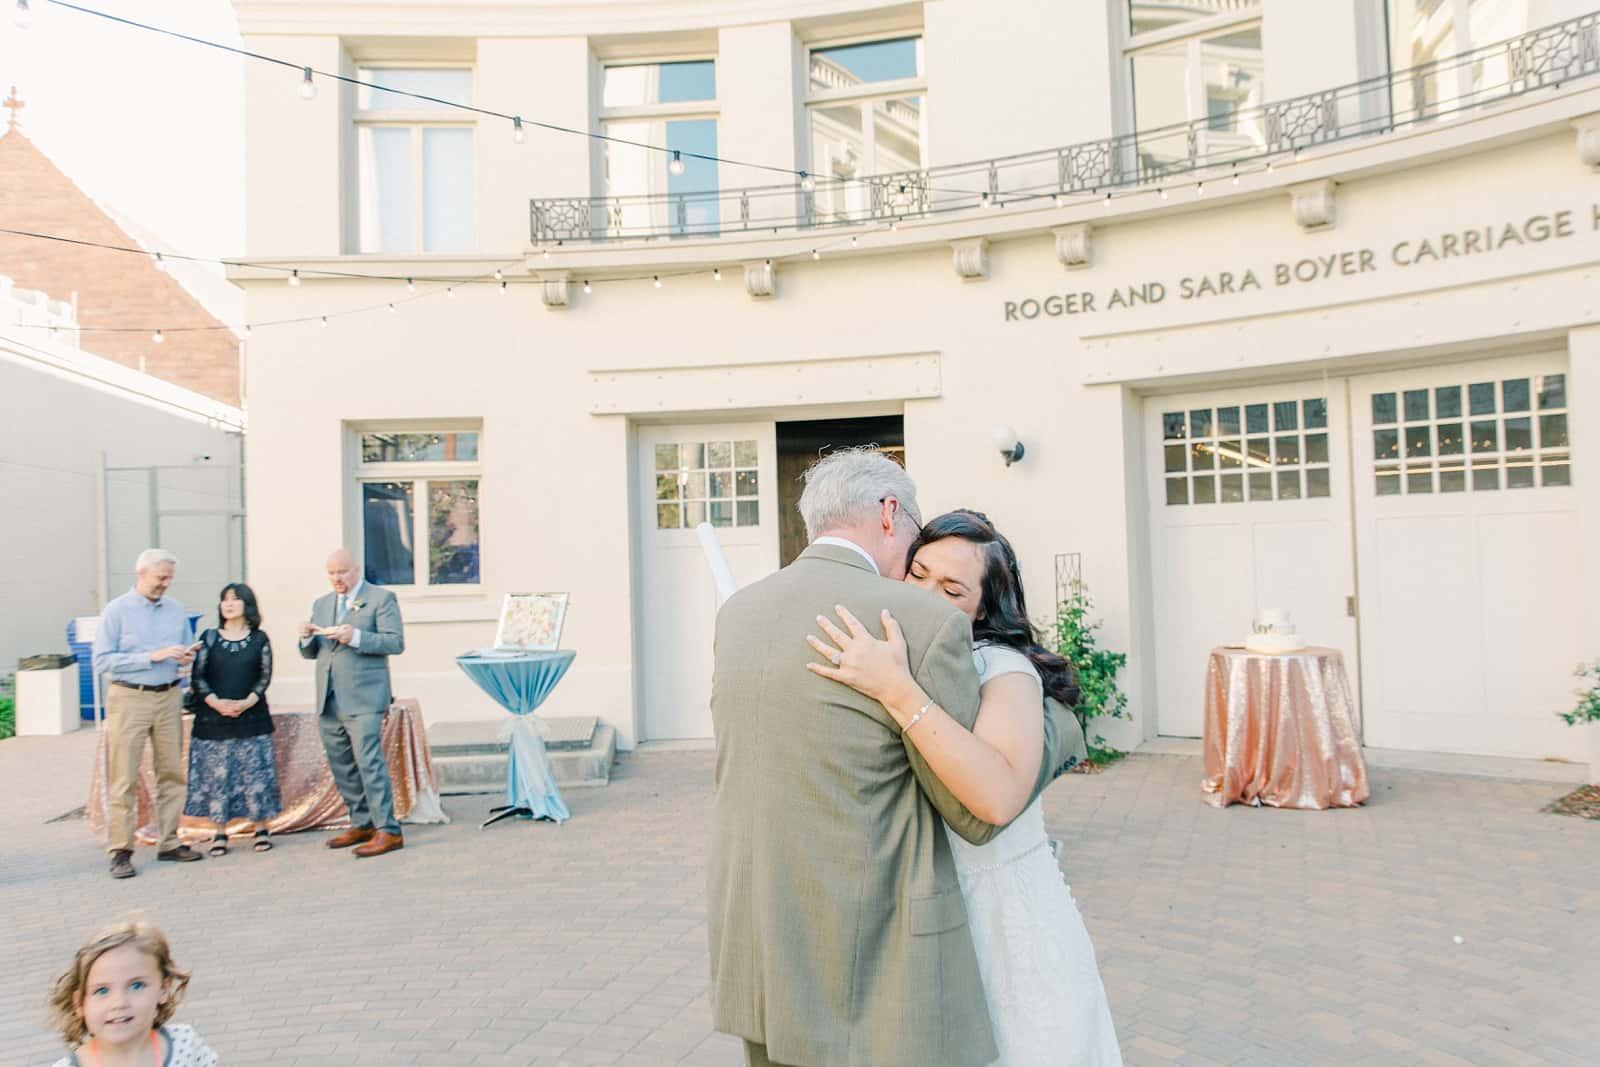 Thomas S. Monson Center Wedding, Salt Lake LDS Temple Wedding, Utah wedding photography. bride and father daddy daughter dance